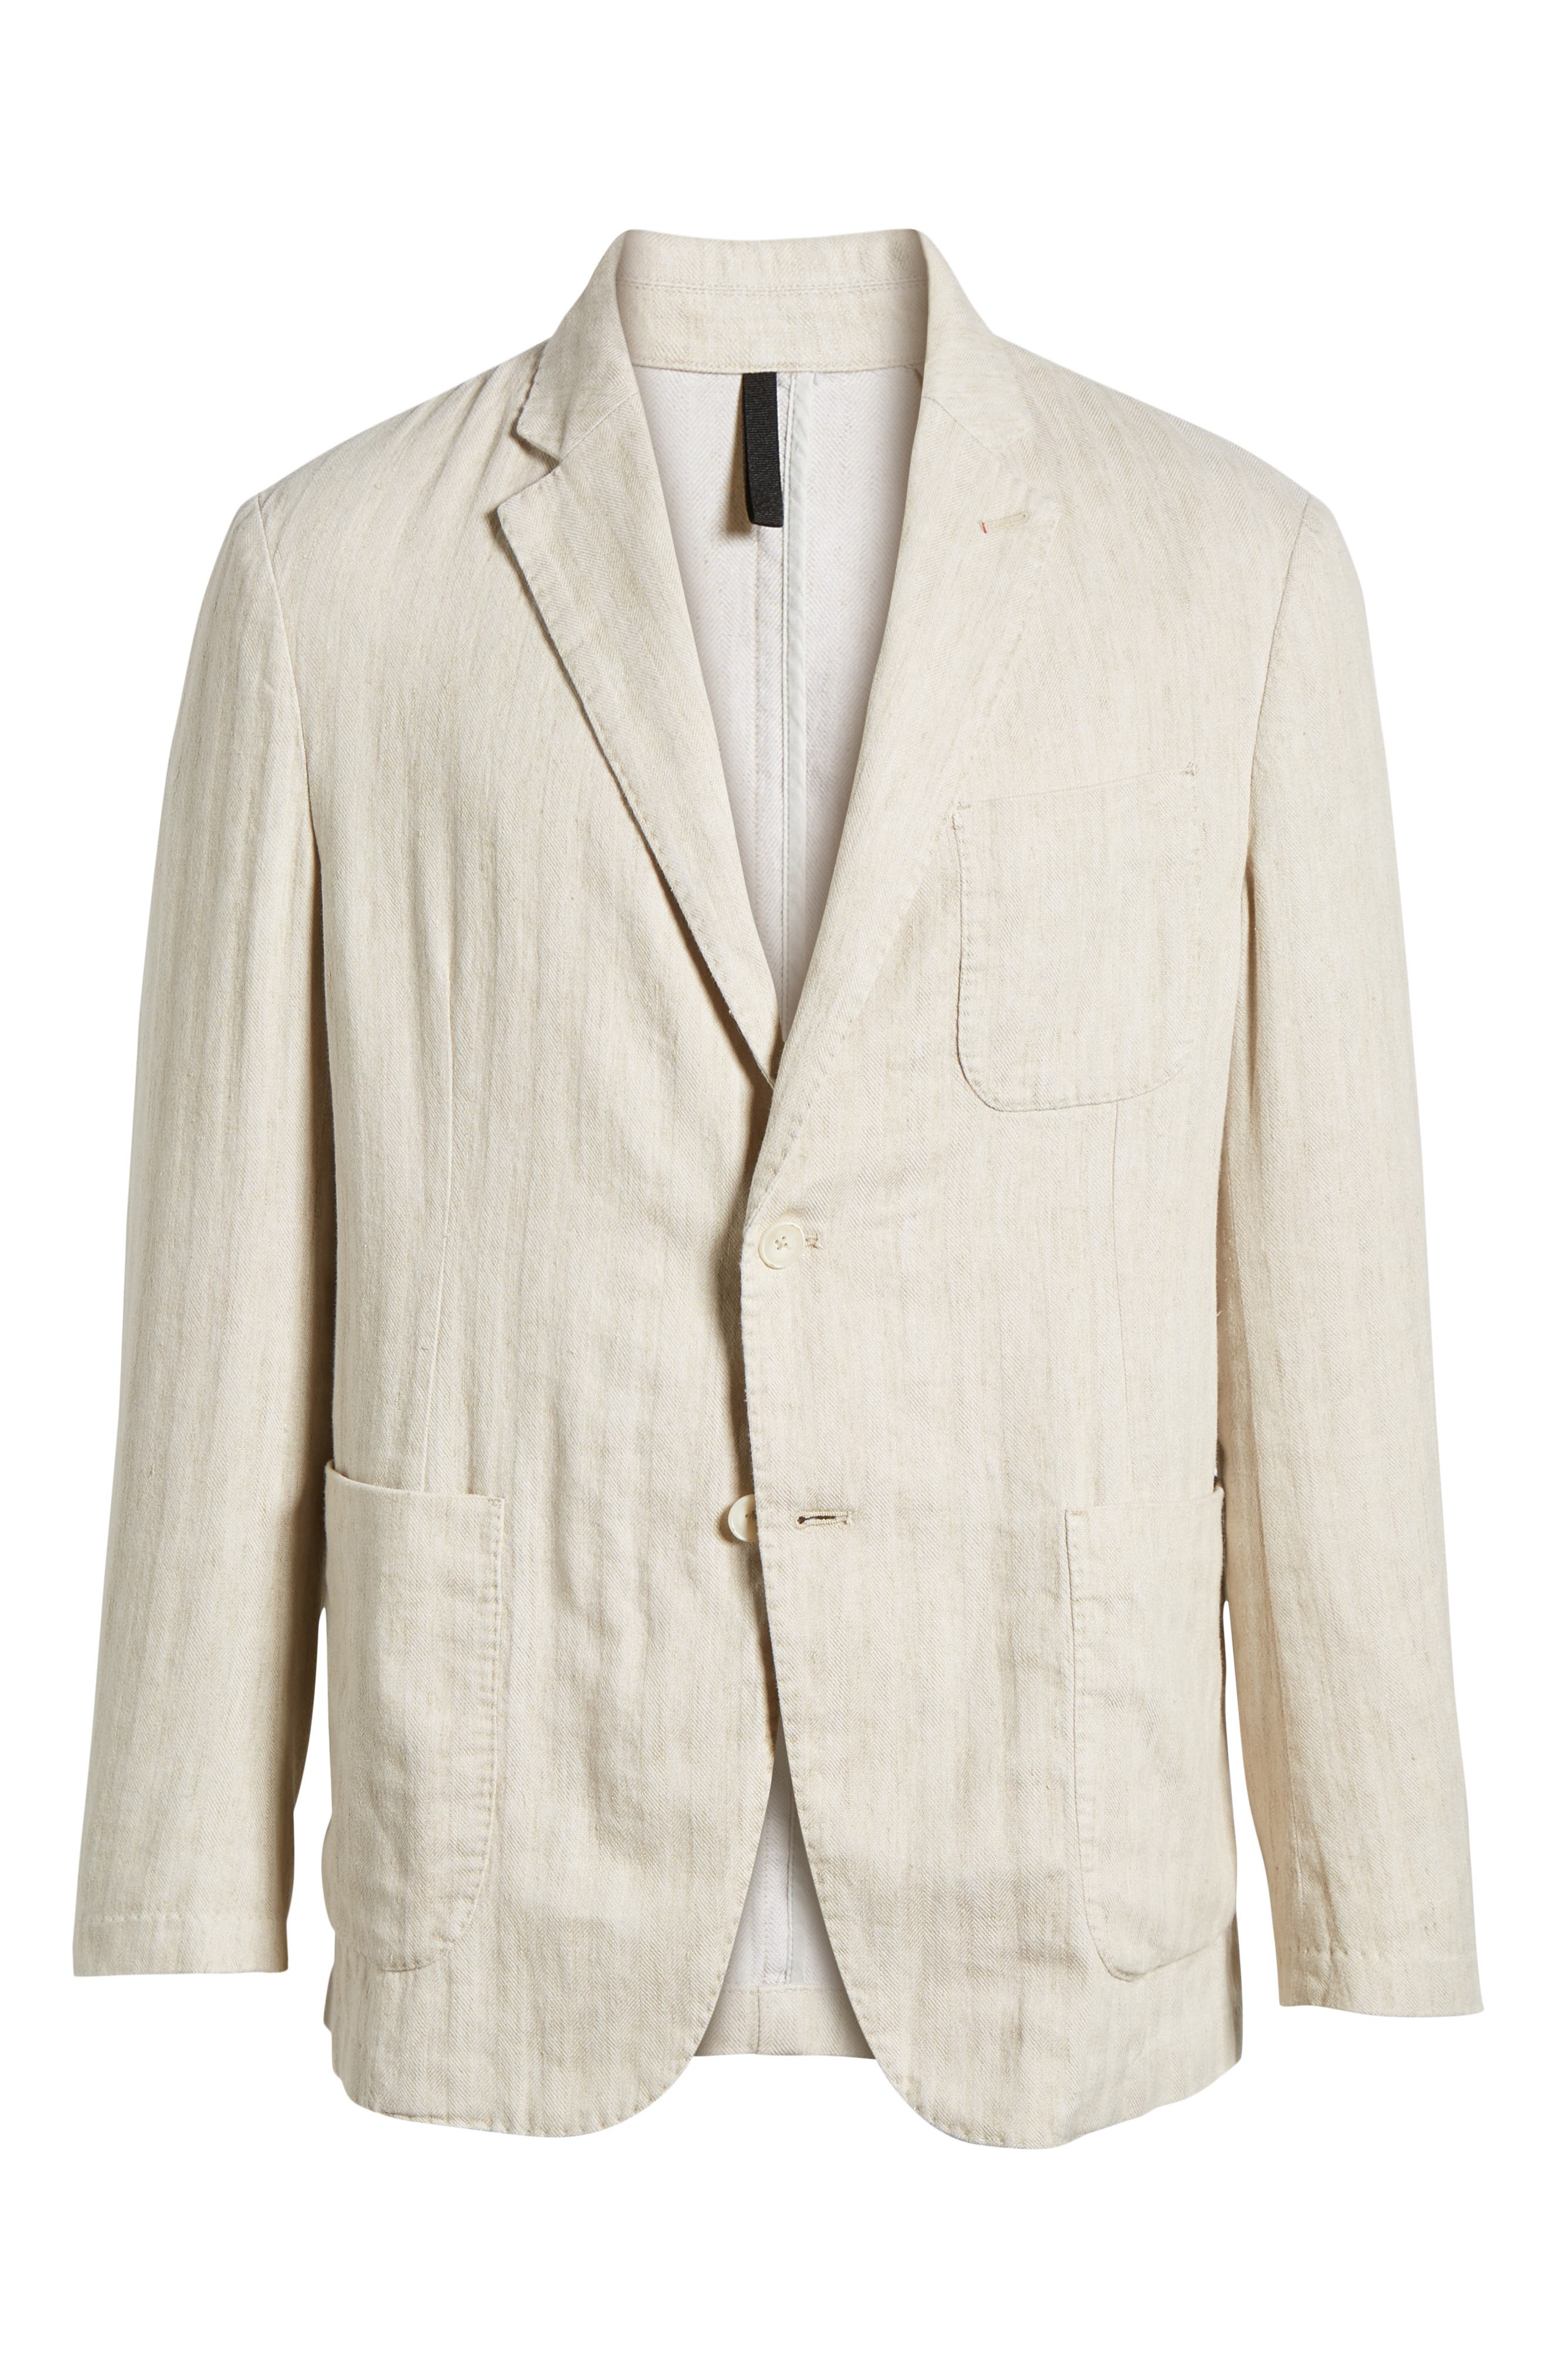 Regular Fit Herringbone Cotton & Linen Blazer,                             Alternate thumbnail 5, color,                             200